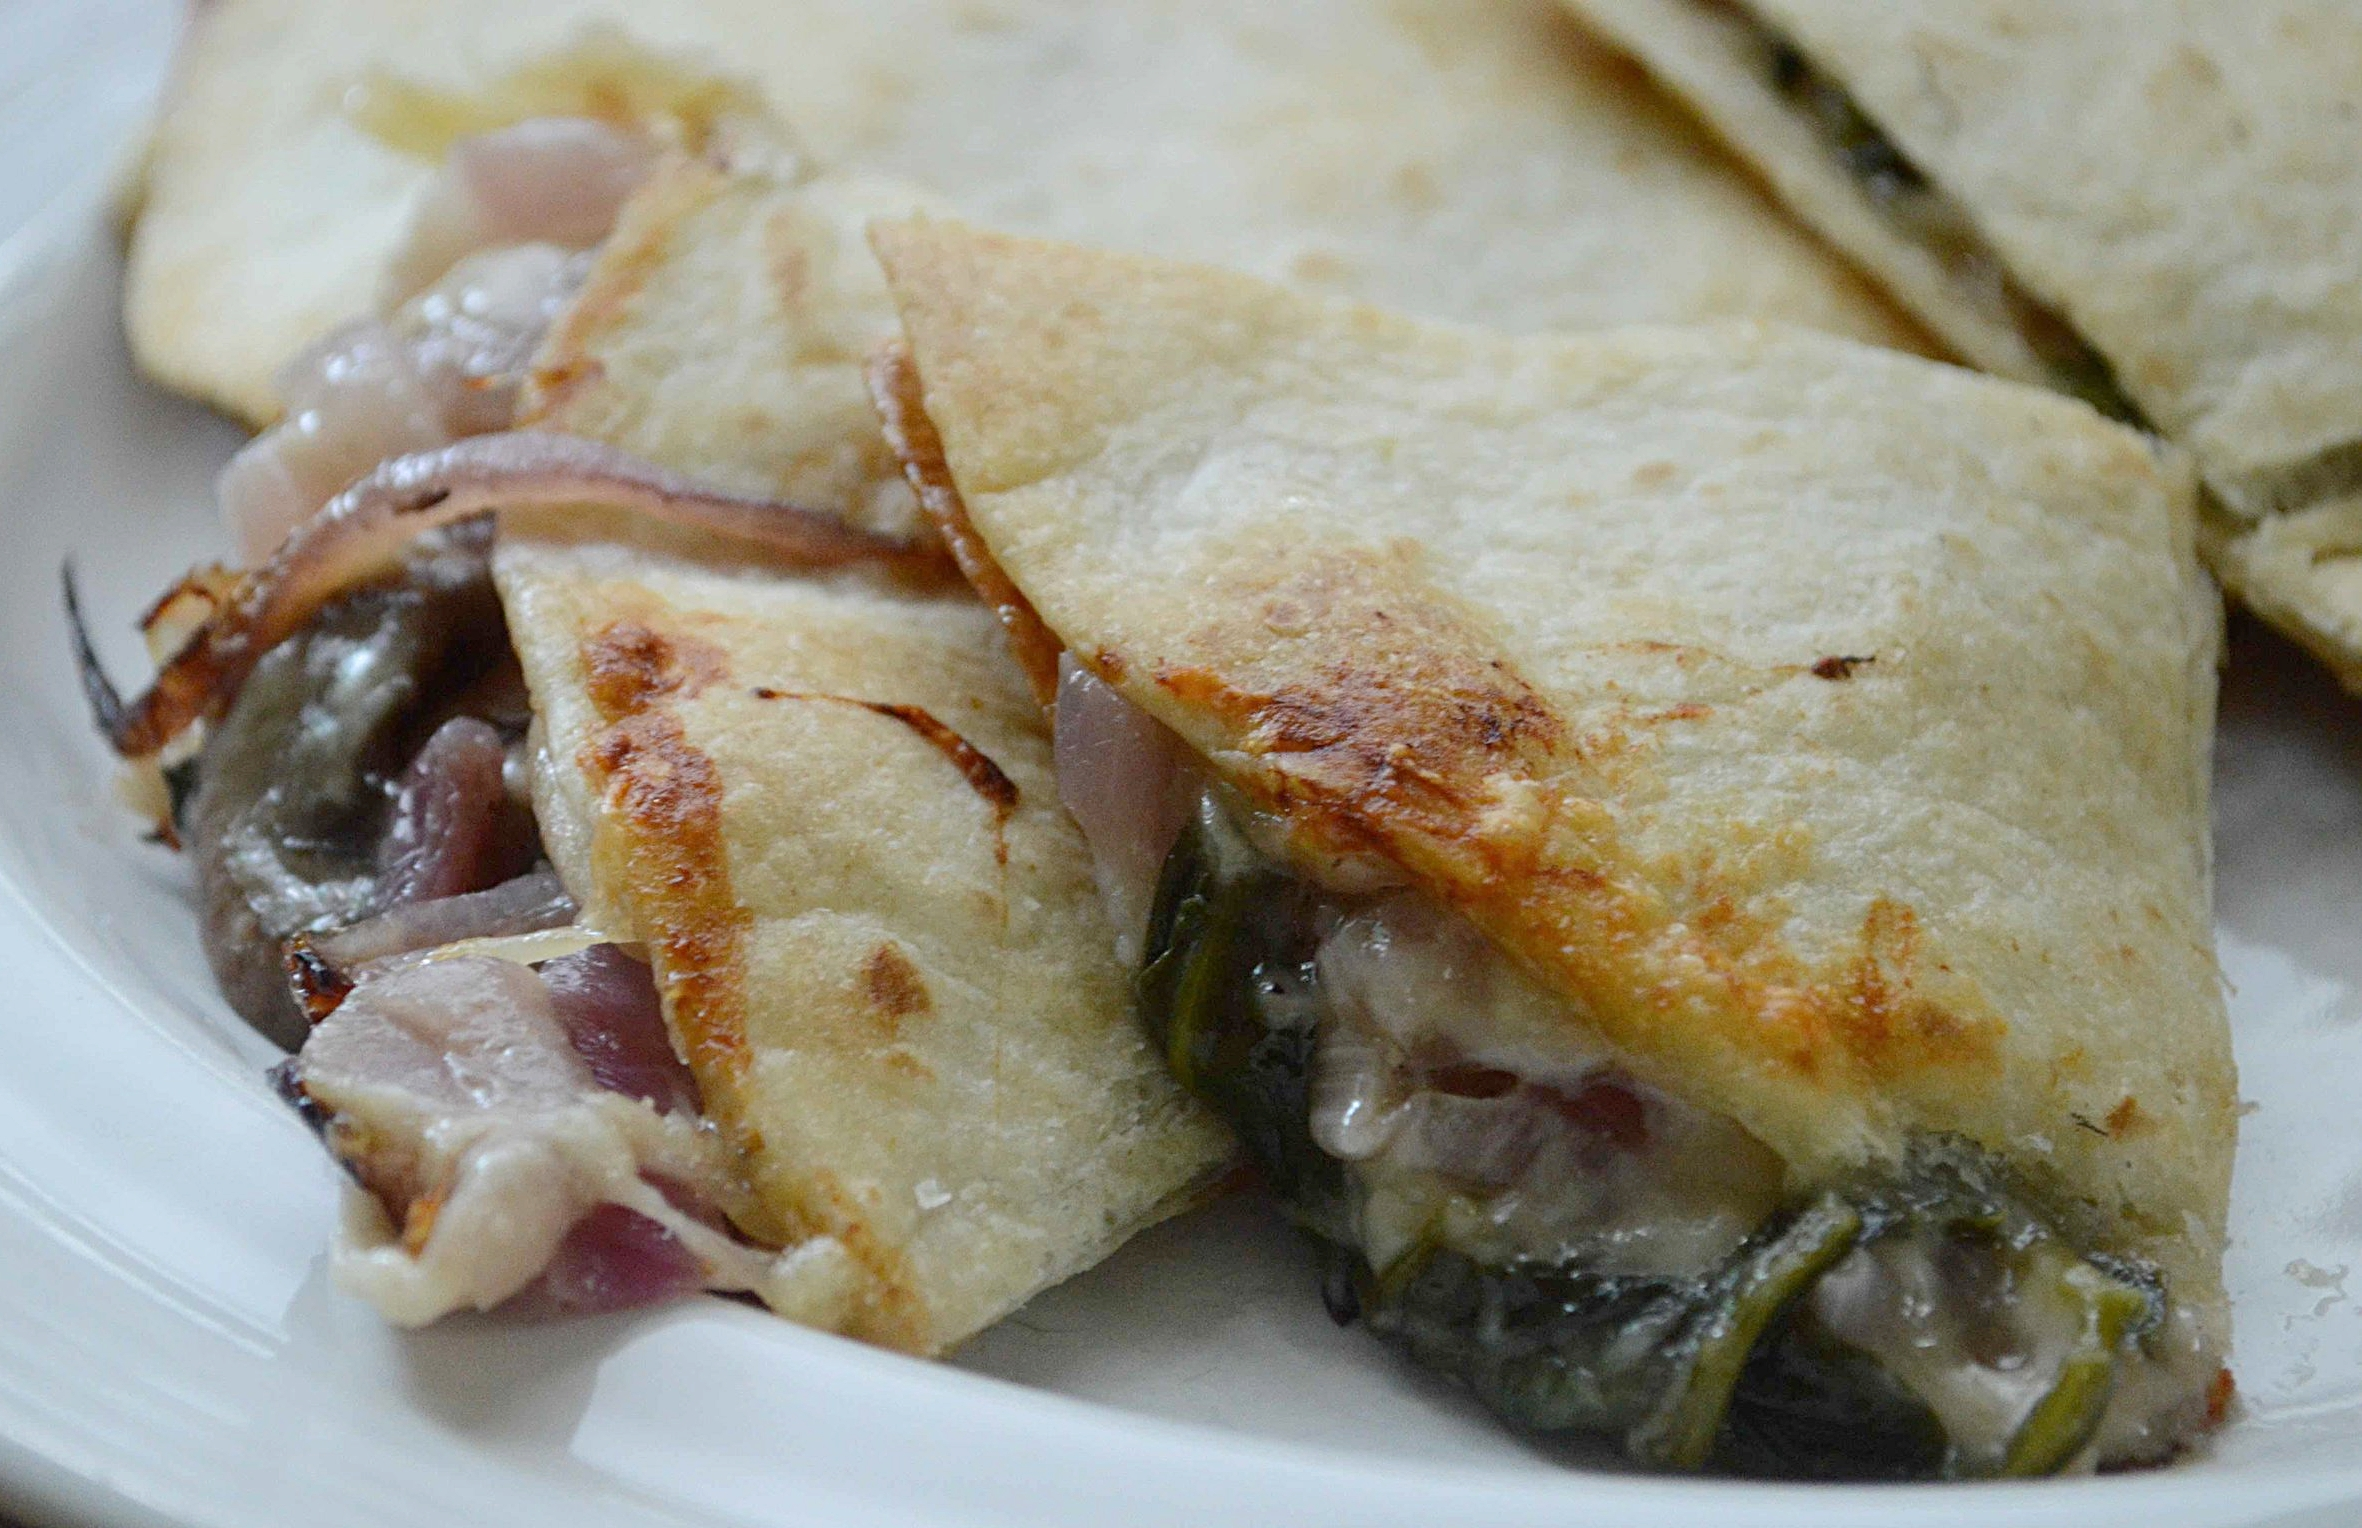 Mushroom and Spinach Quesadillas